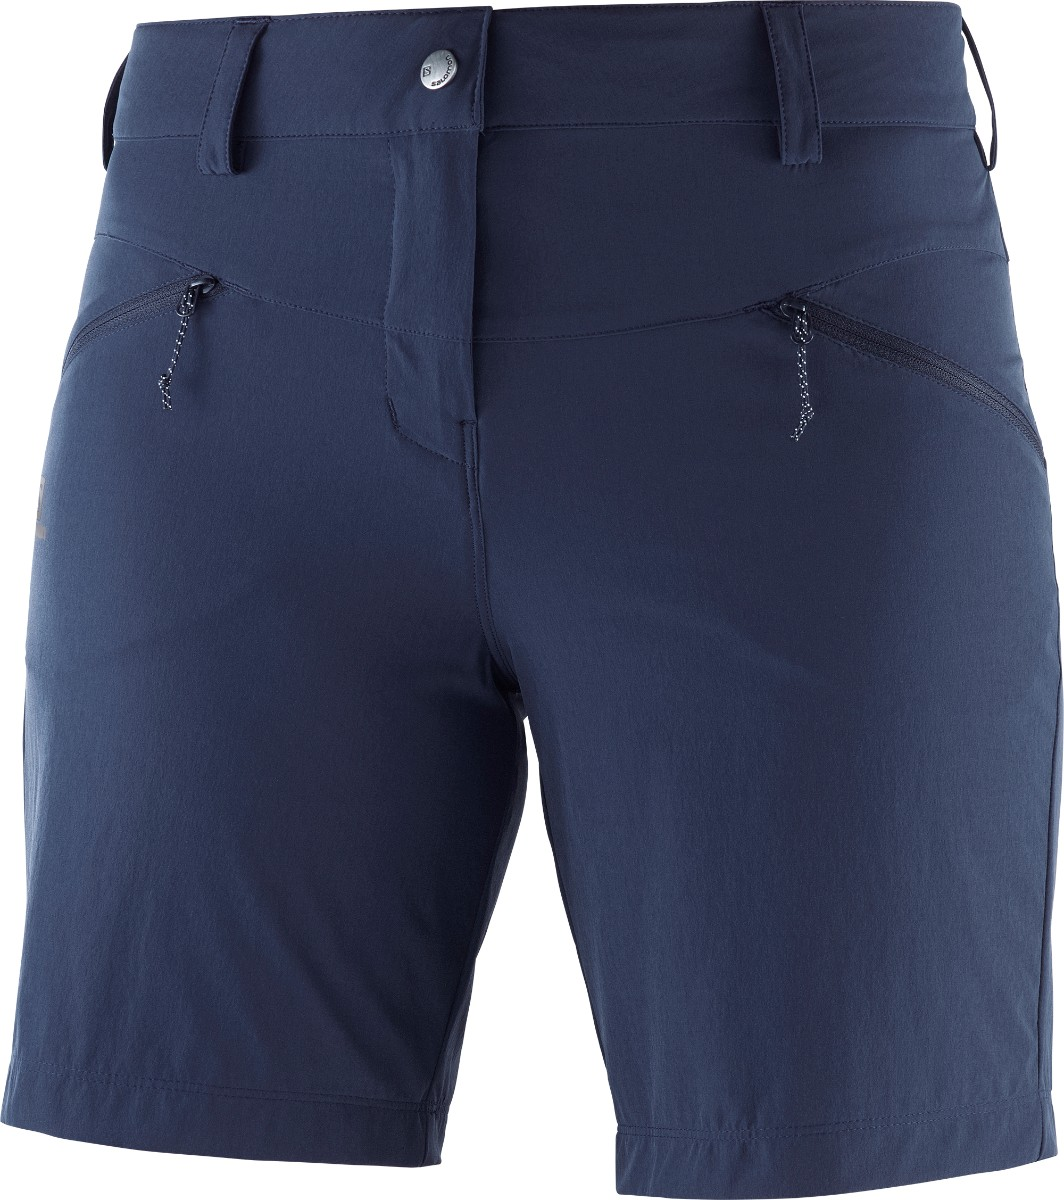 Salomon WAYFARER LT SHORT, hlače, modra